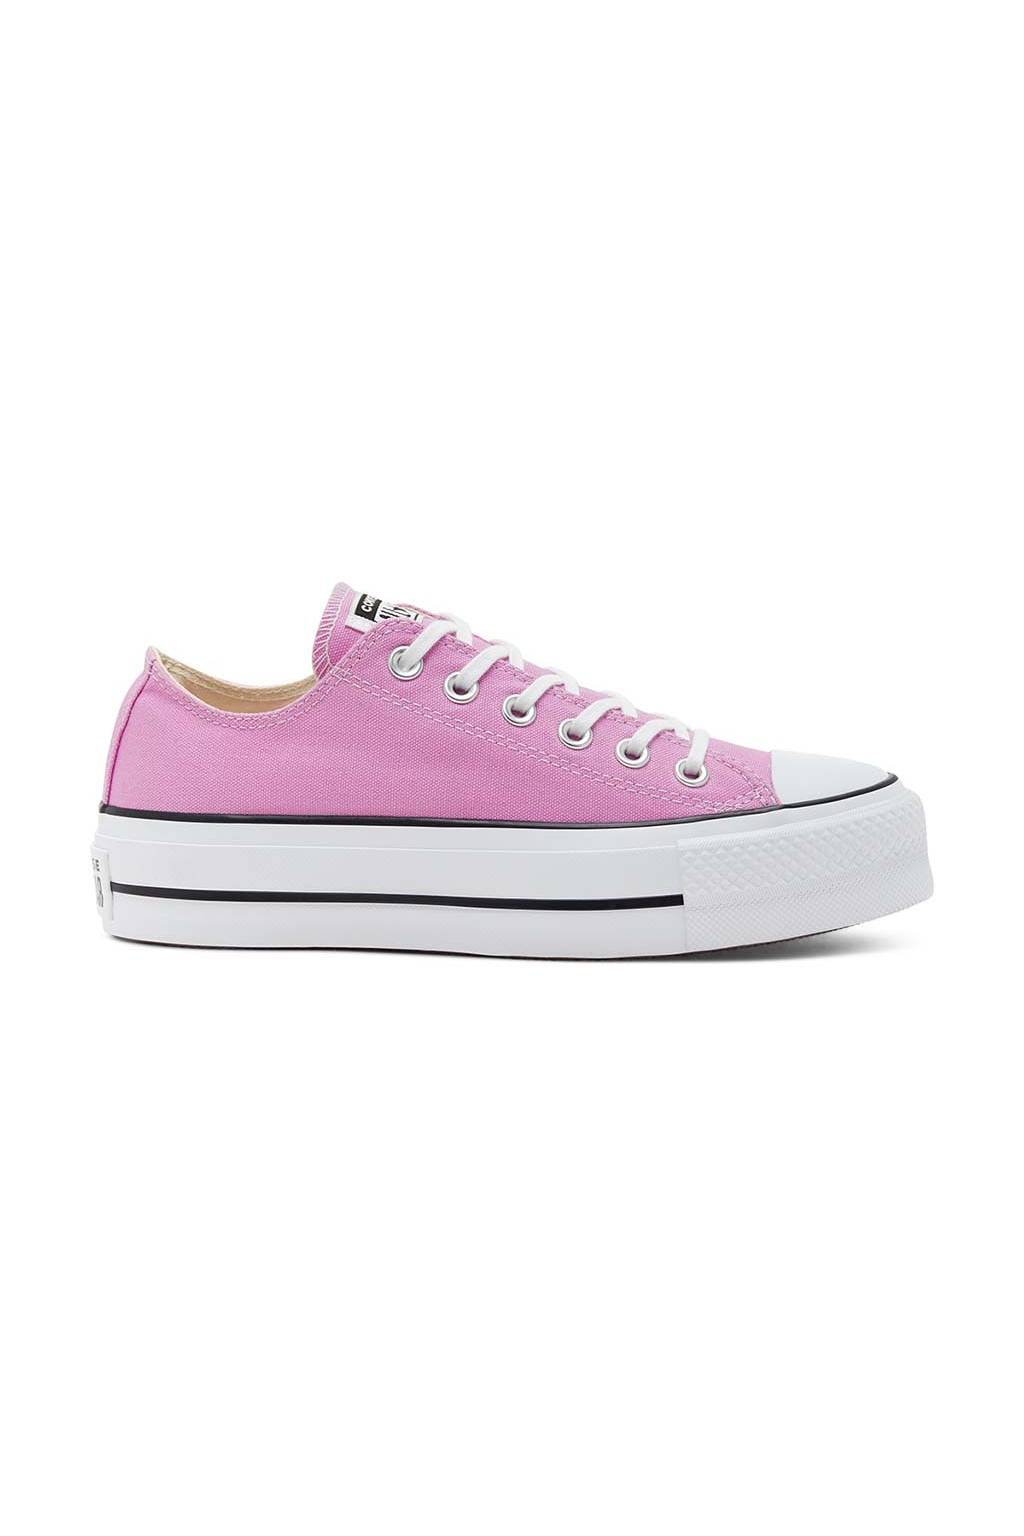 Chuck Taylor All Star Lift Pink 566756C